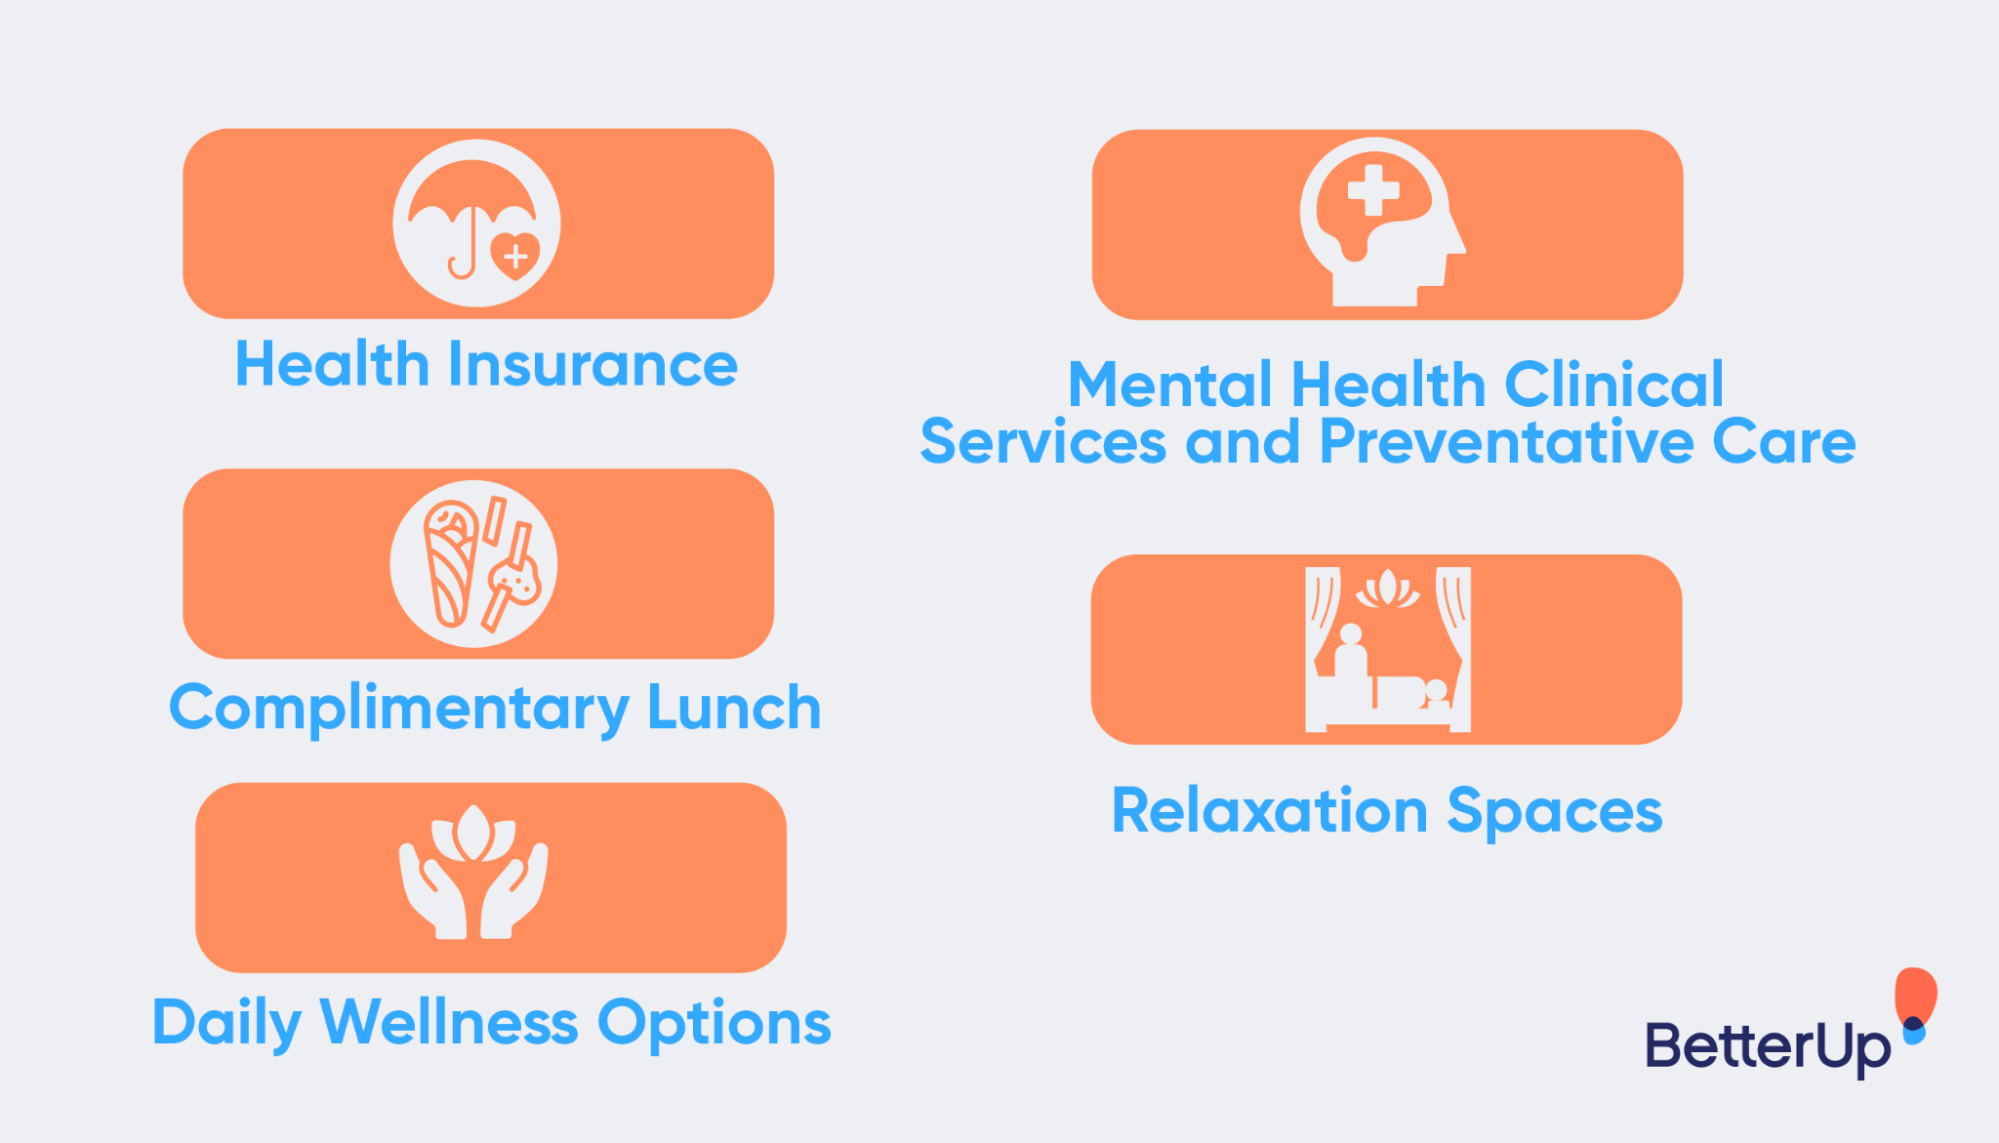 wellness-benefits-best-job-benefits